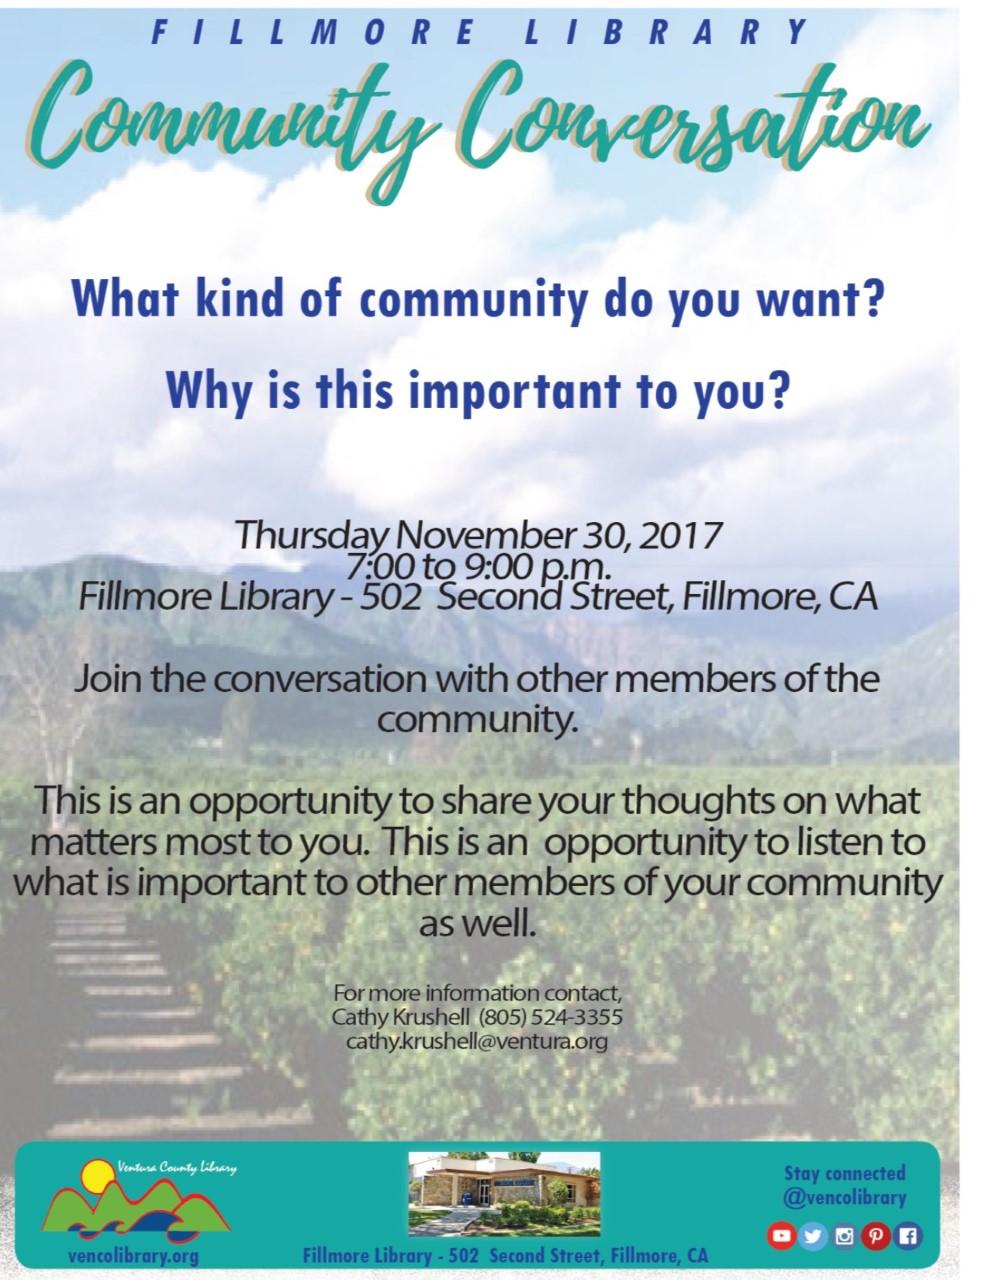 Community Conversation Nov 30, 2017.jpg